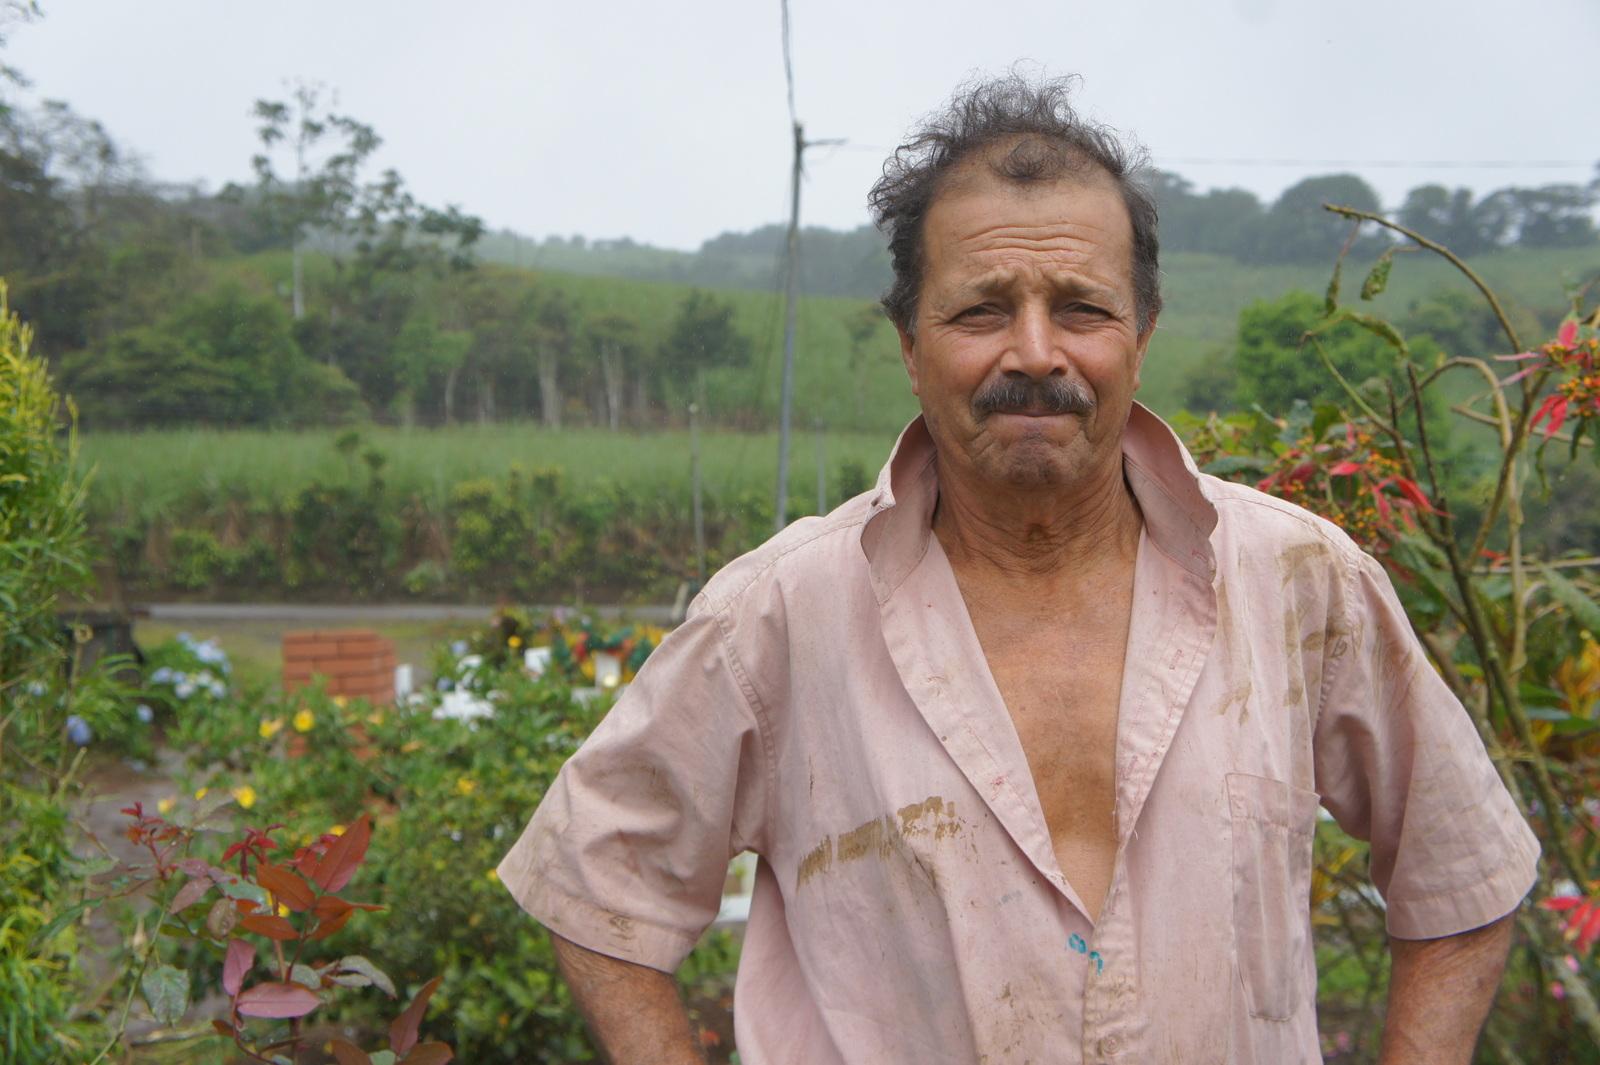 Misael Elizondo Zamora